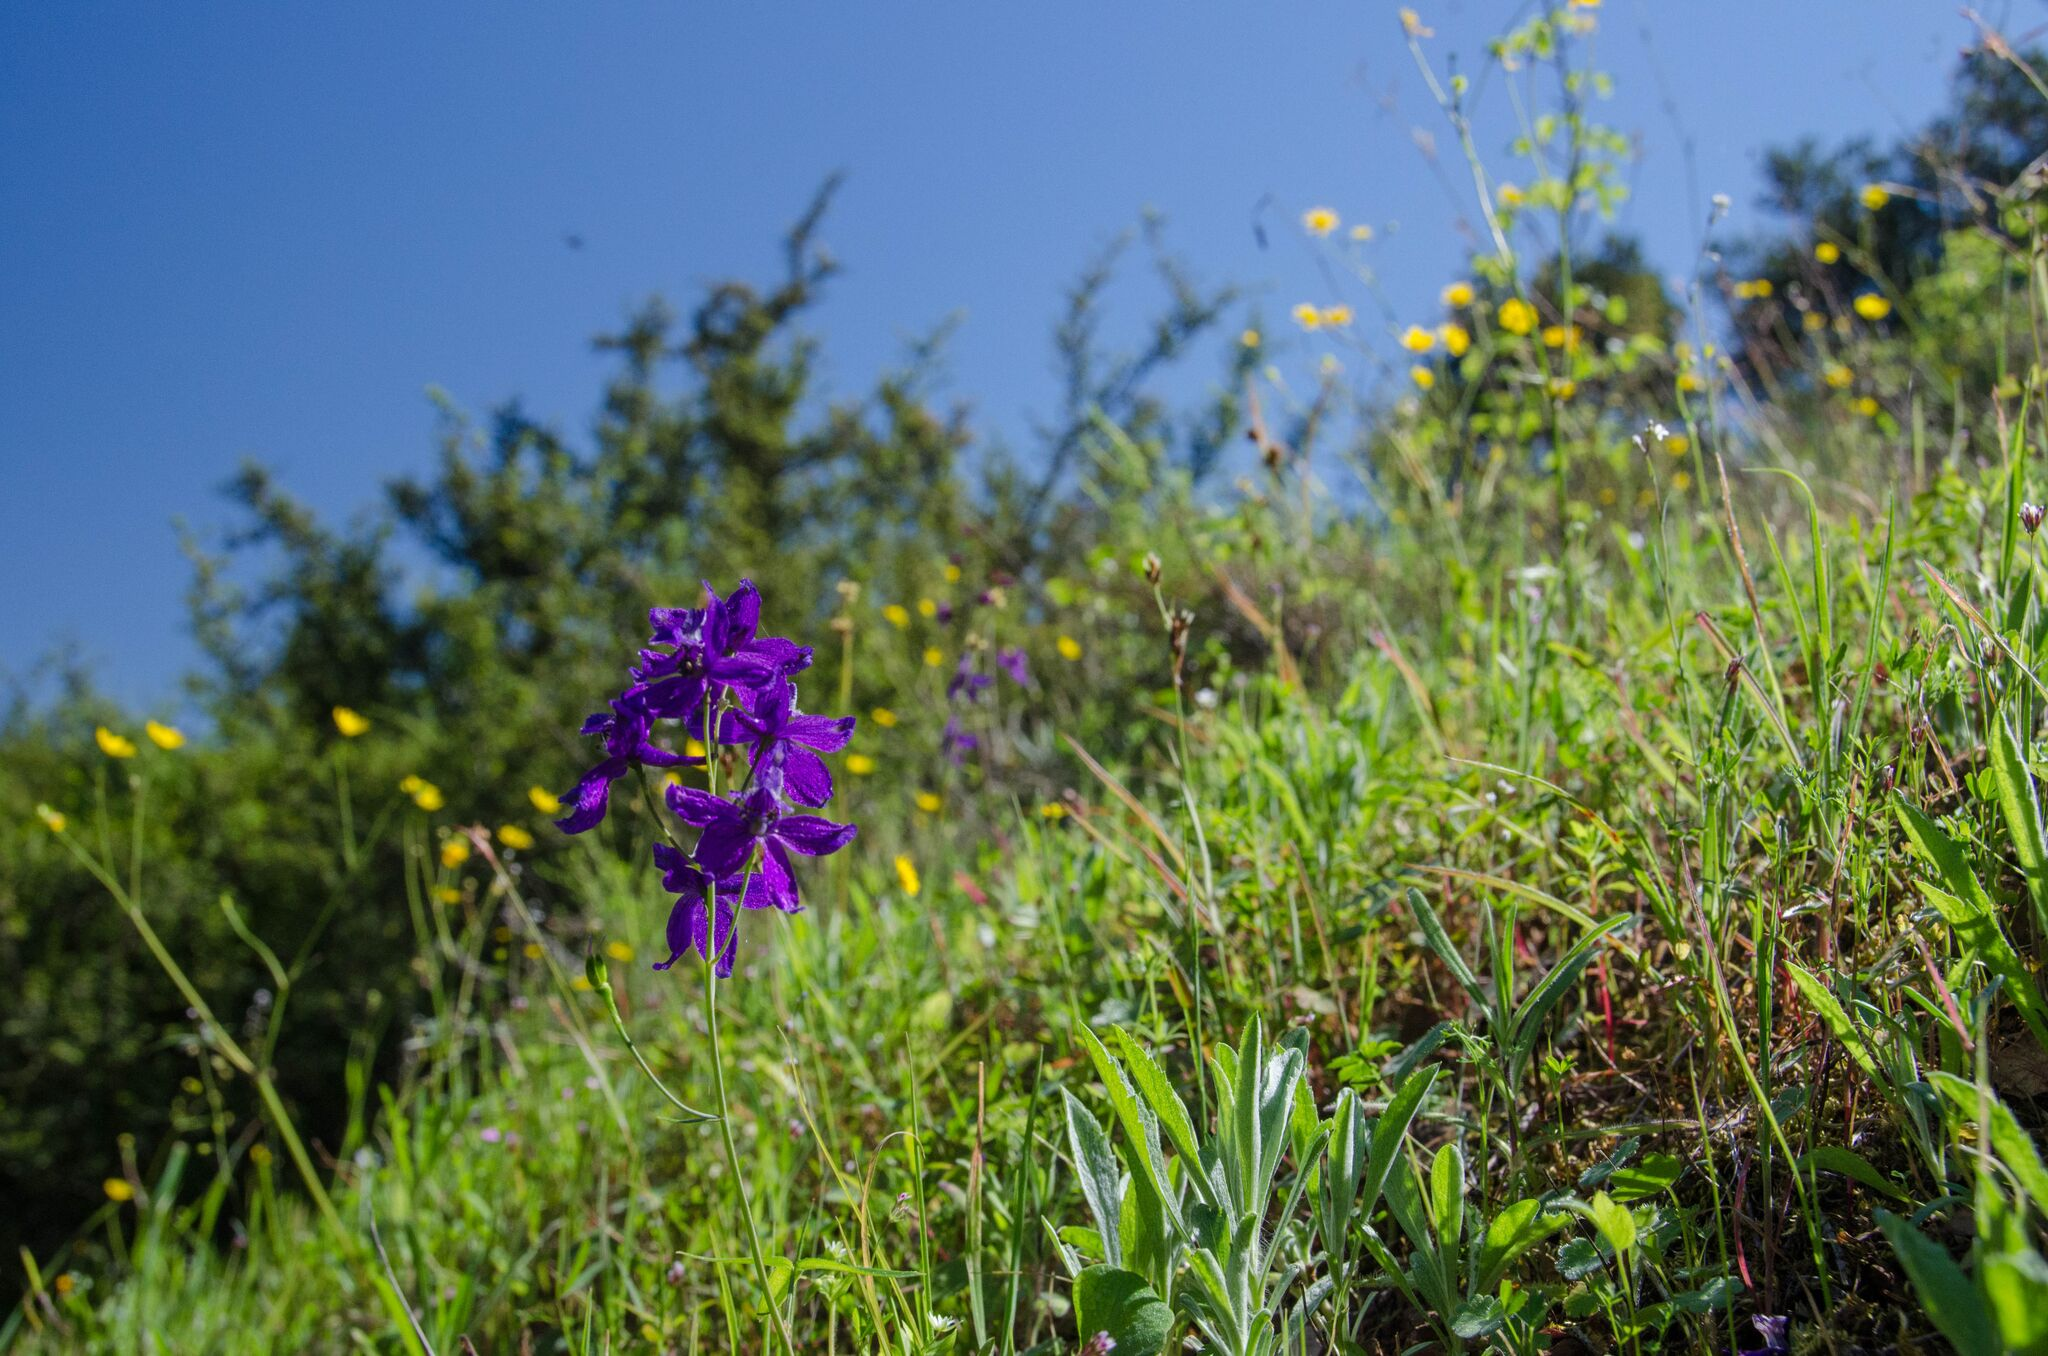 Mayfair-Trail_Rancho-Canada-del-Oro-Open-Space-Preserve_Cassie-Kifer-14_preview